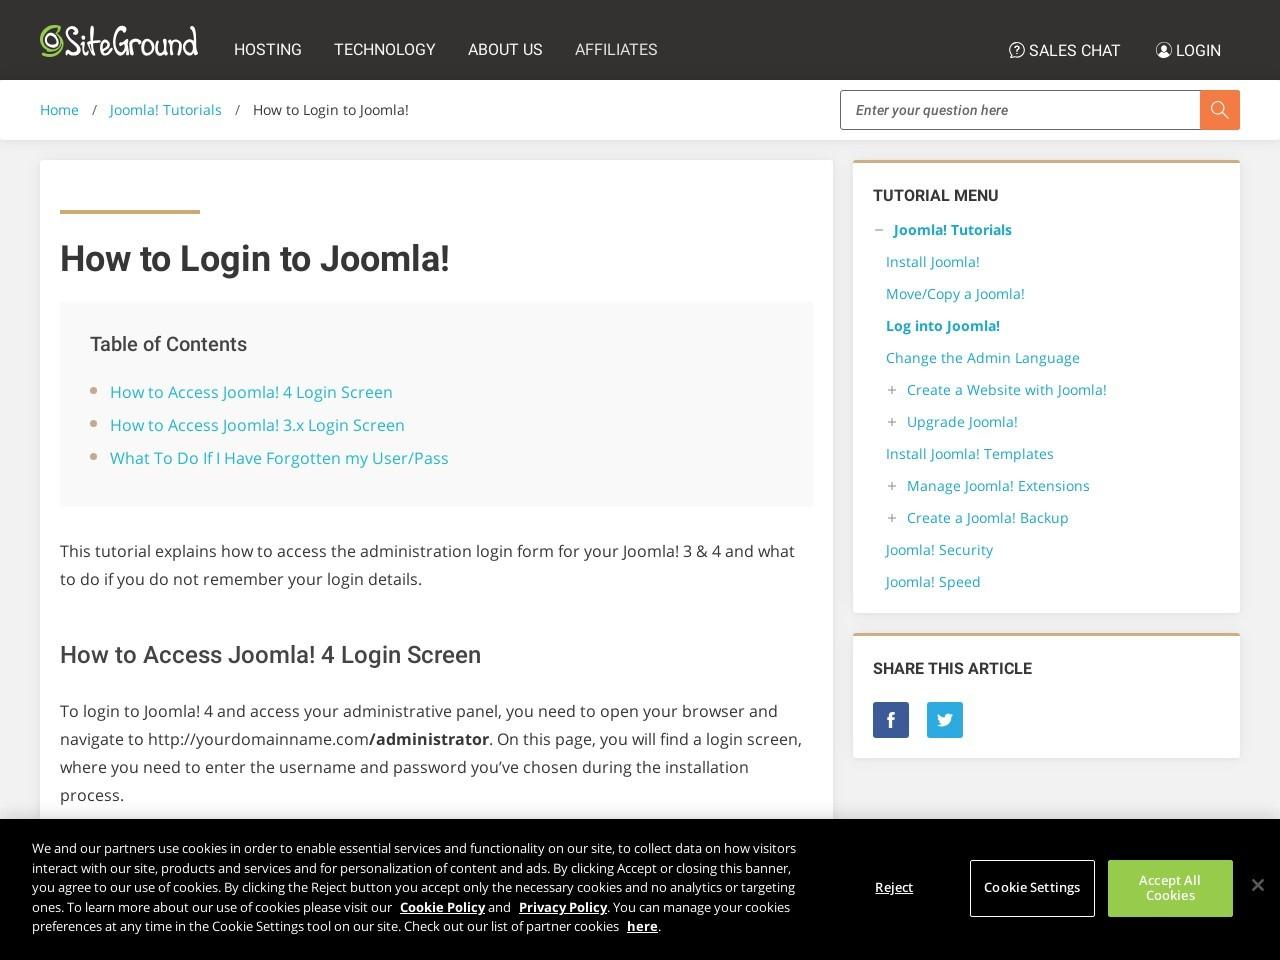 How to Login to Joomla! - SiteGround